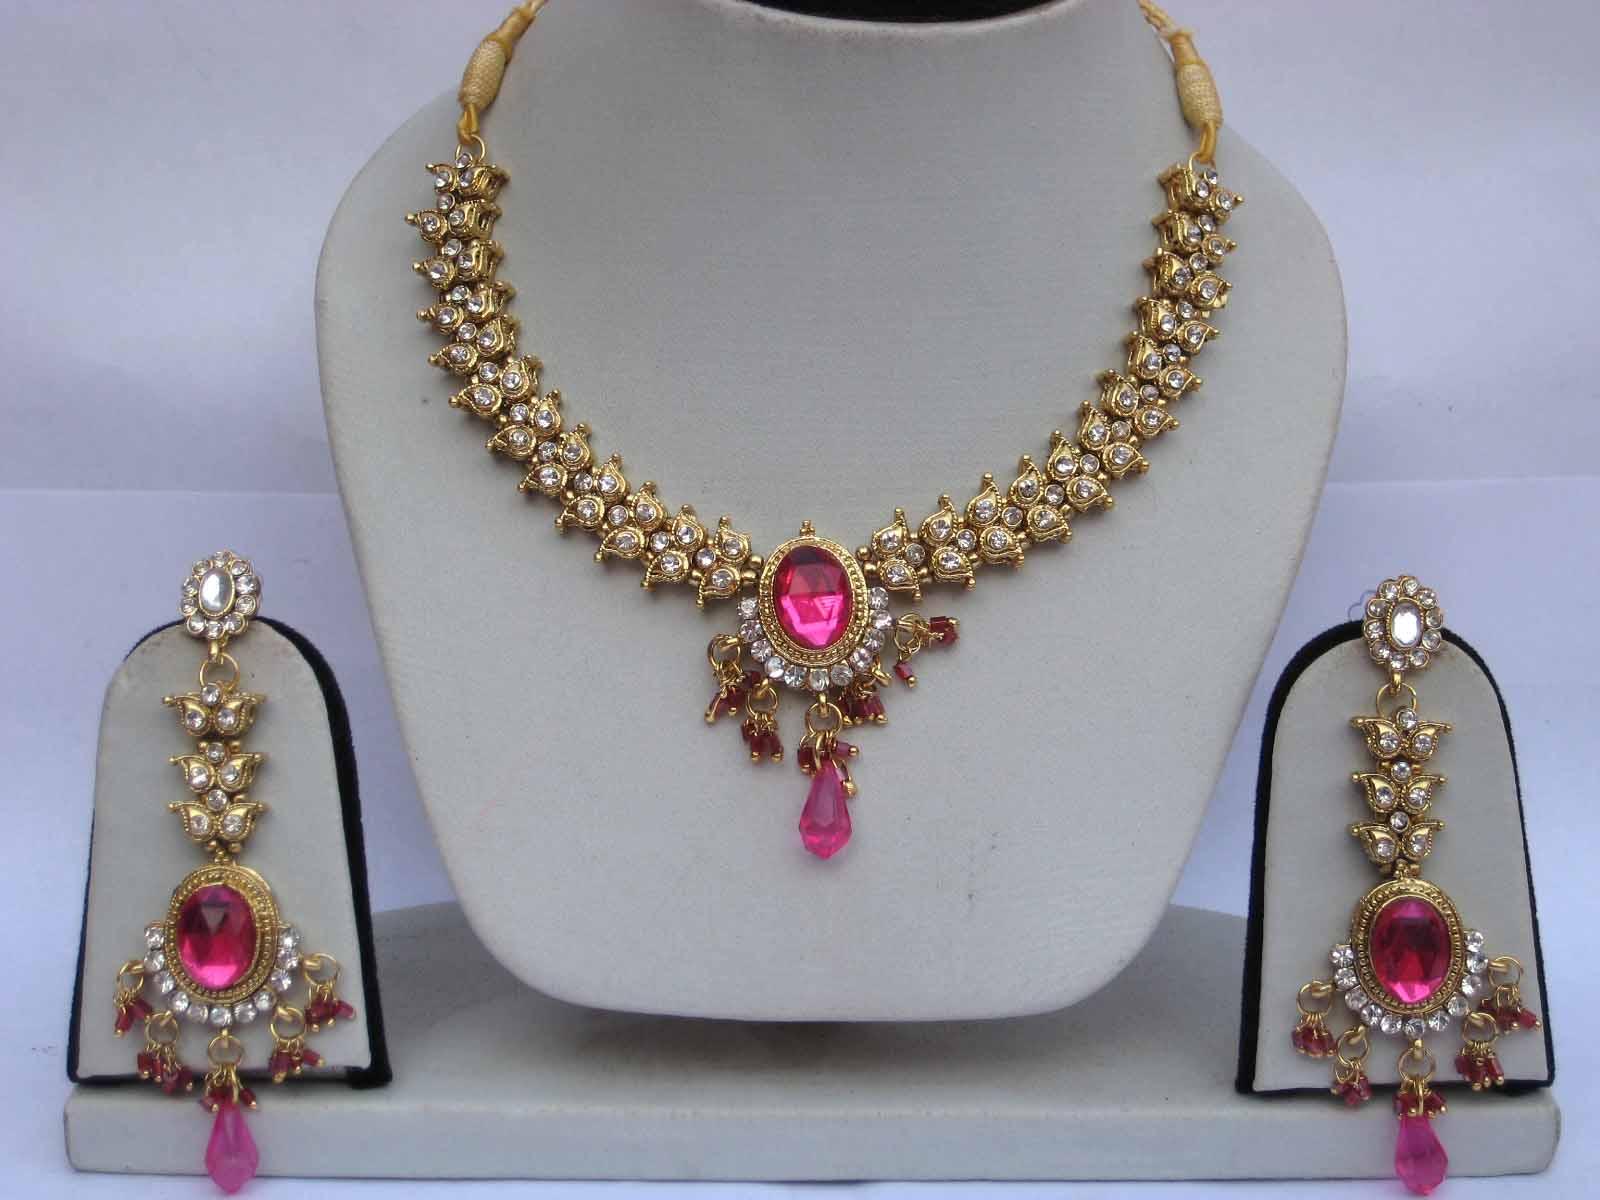 jewellery stores, jewellery online, jewellery fashion, indian jewellery designs, indian jewellery, jewellery definition, jewellery making, jewellery exchange-119